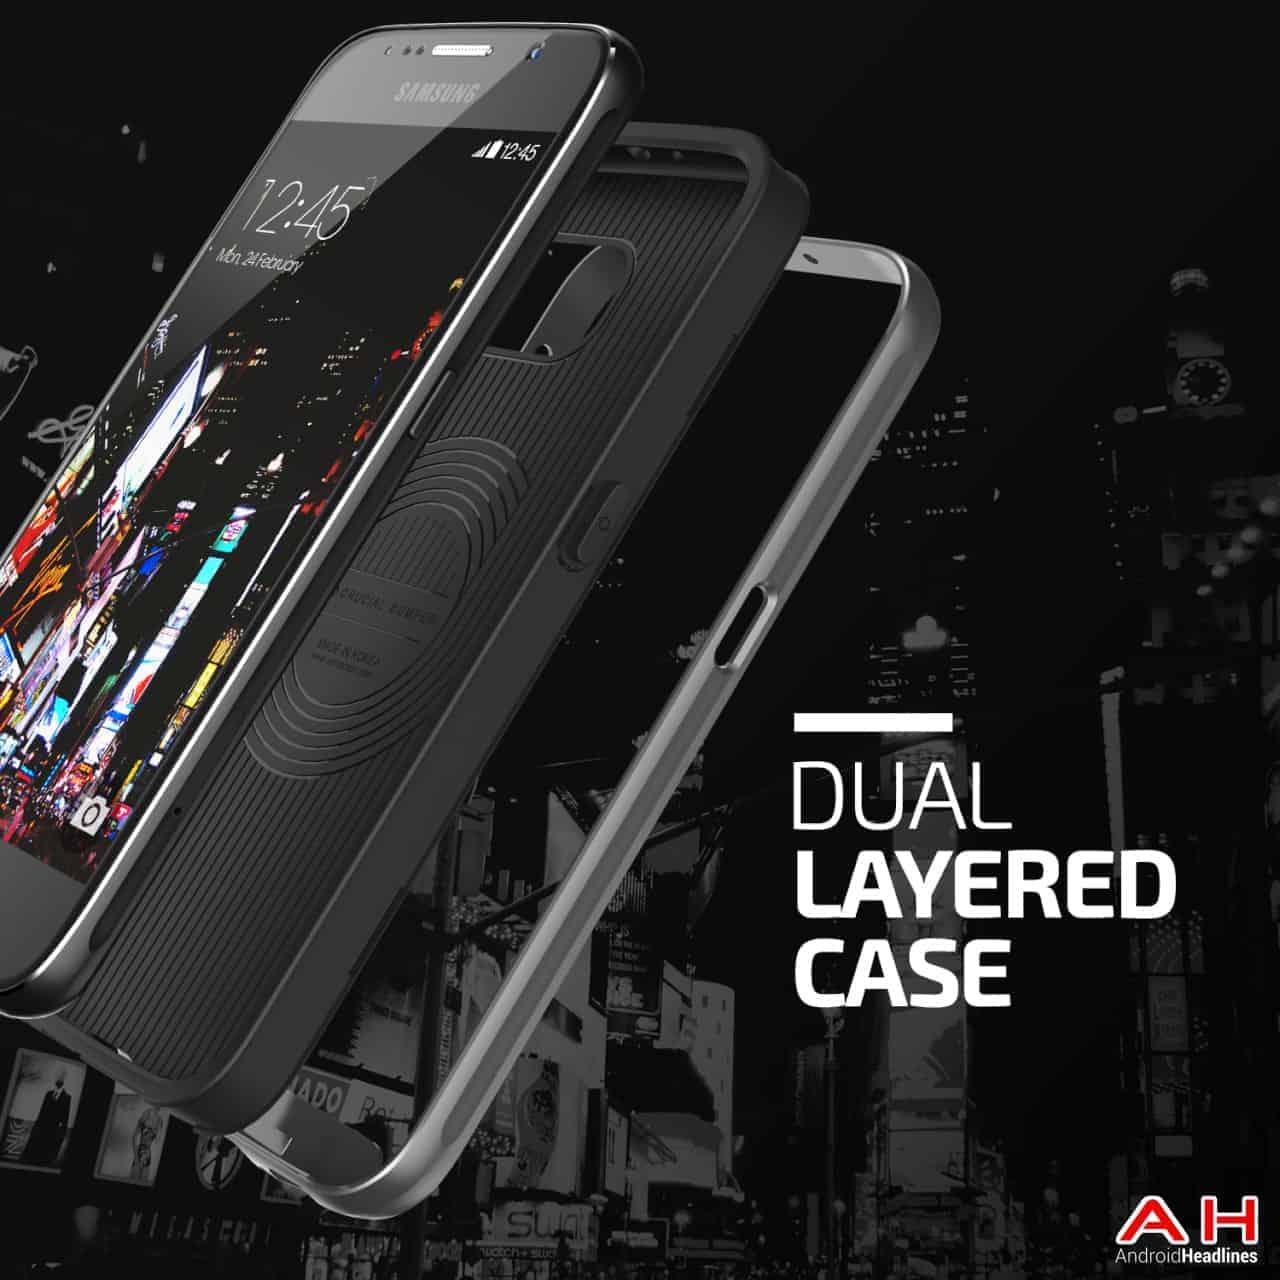 AH Samsung Galaxy S6 Verus Leaked Images 2